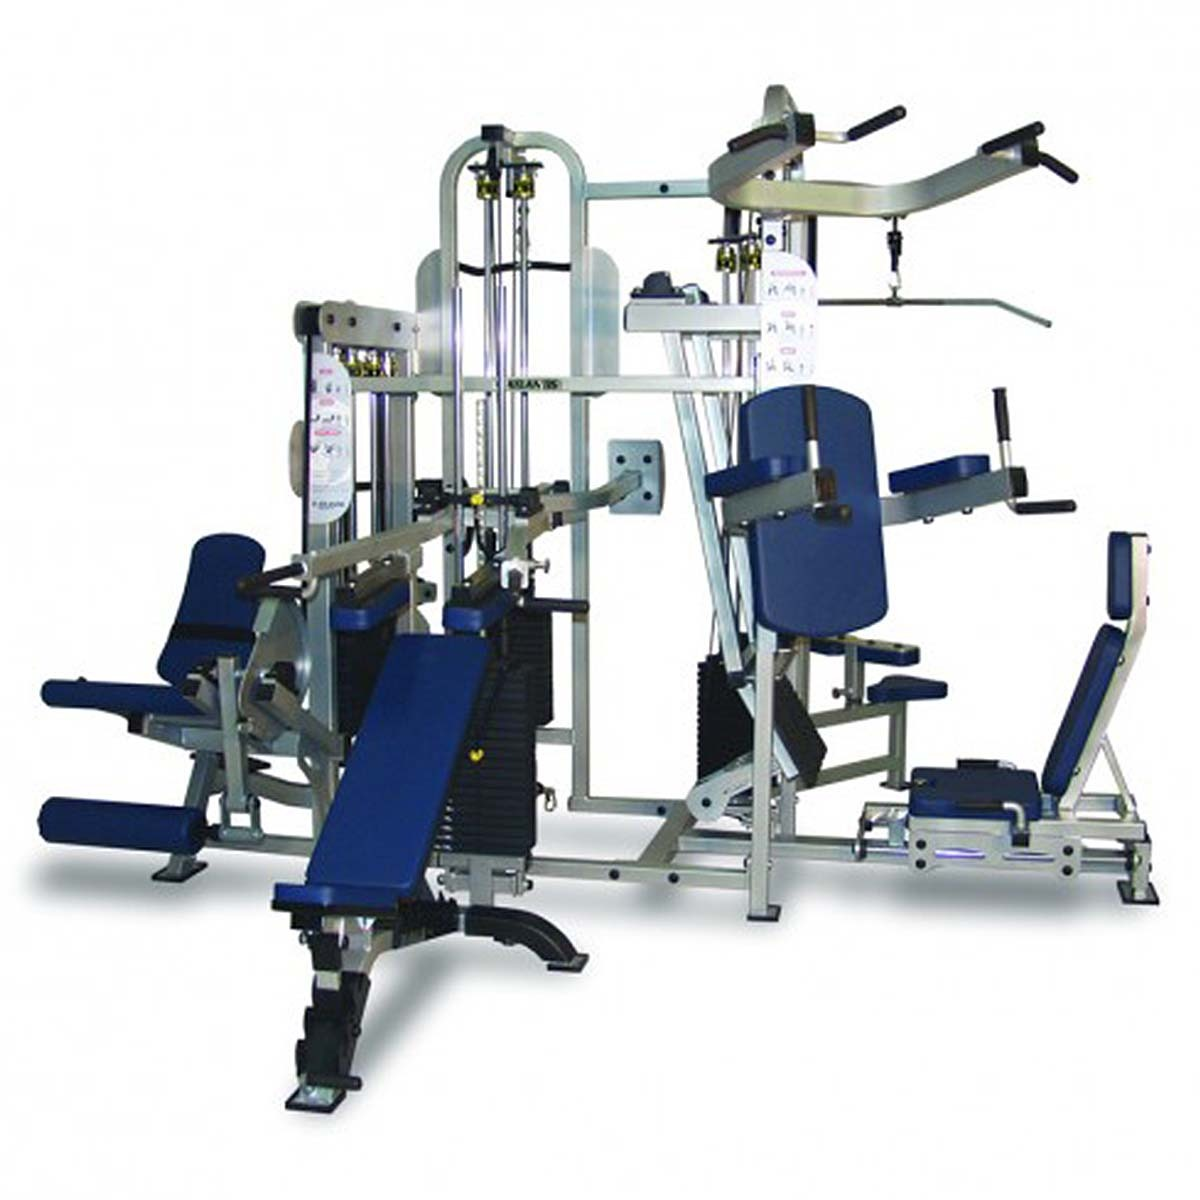 Surrey Strength Equipment - Atlantis Multi-Stations - Lifestyle Equipment